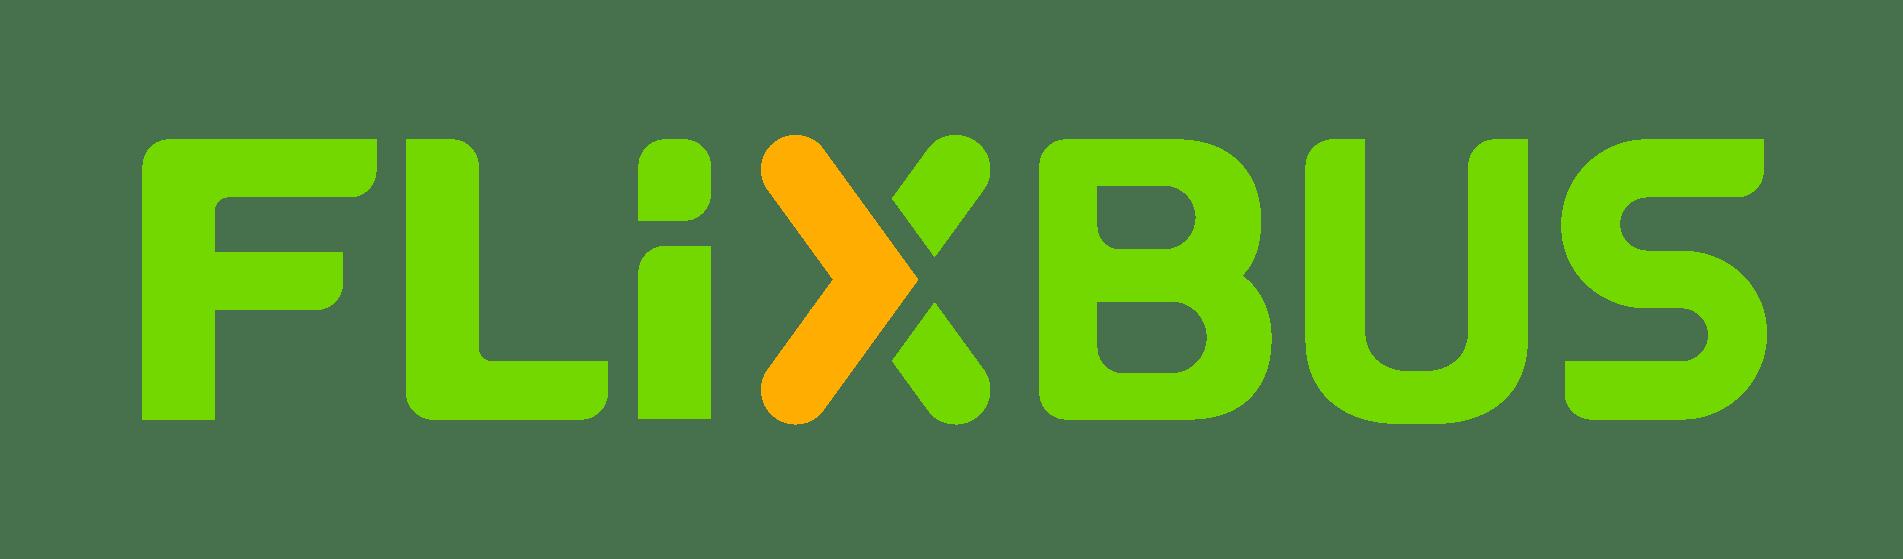 https://www.secomitravel.ro/wp-content/uploads/2019/04/flixbus_logo_rgb.png